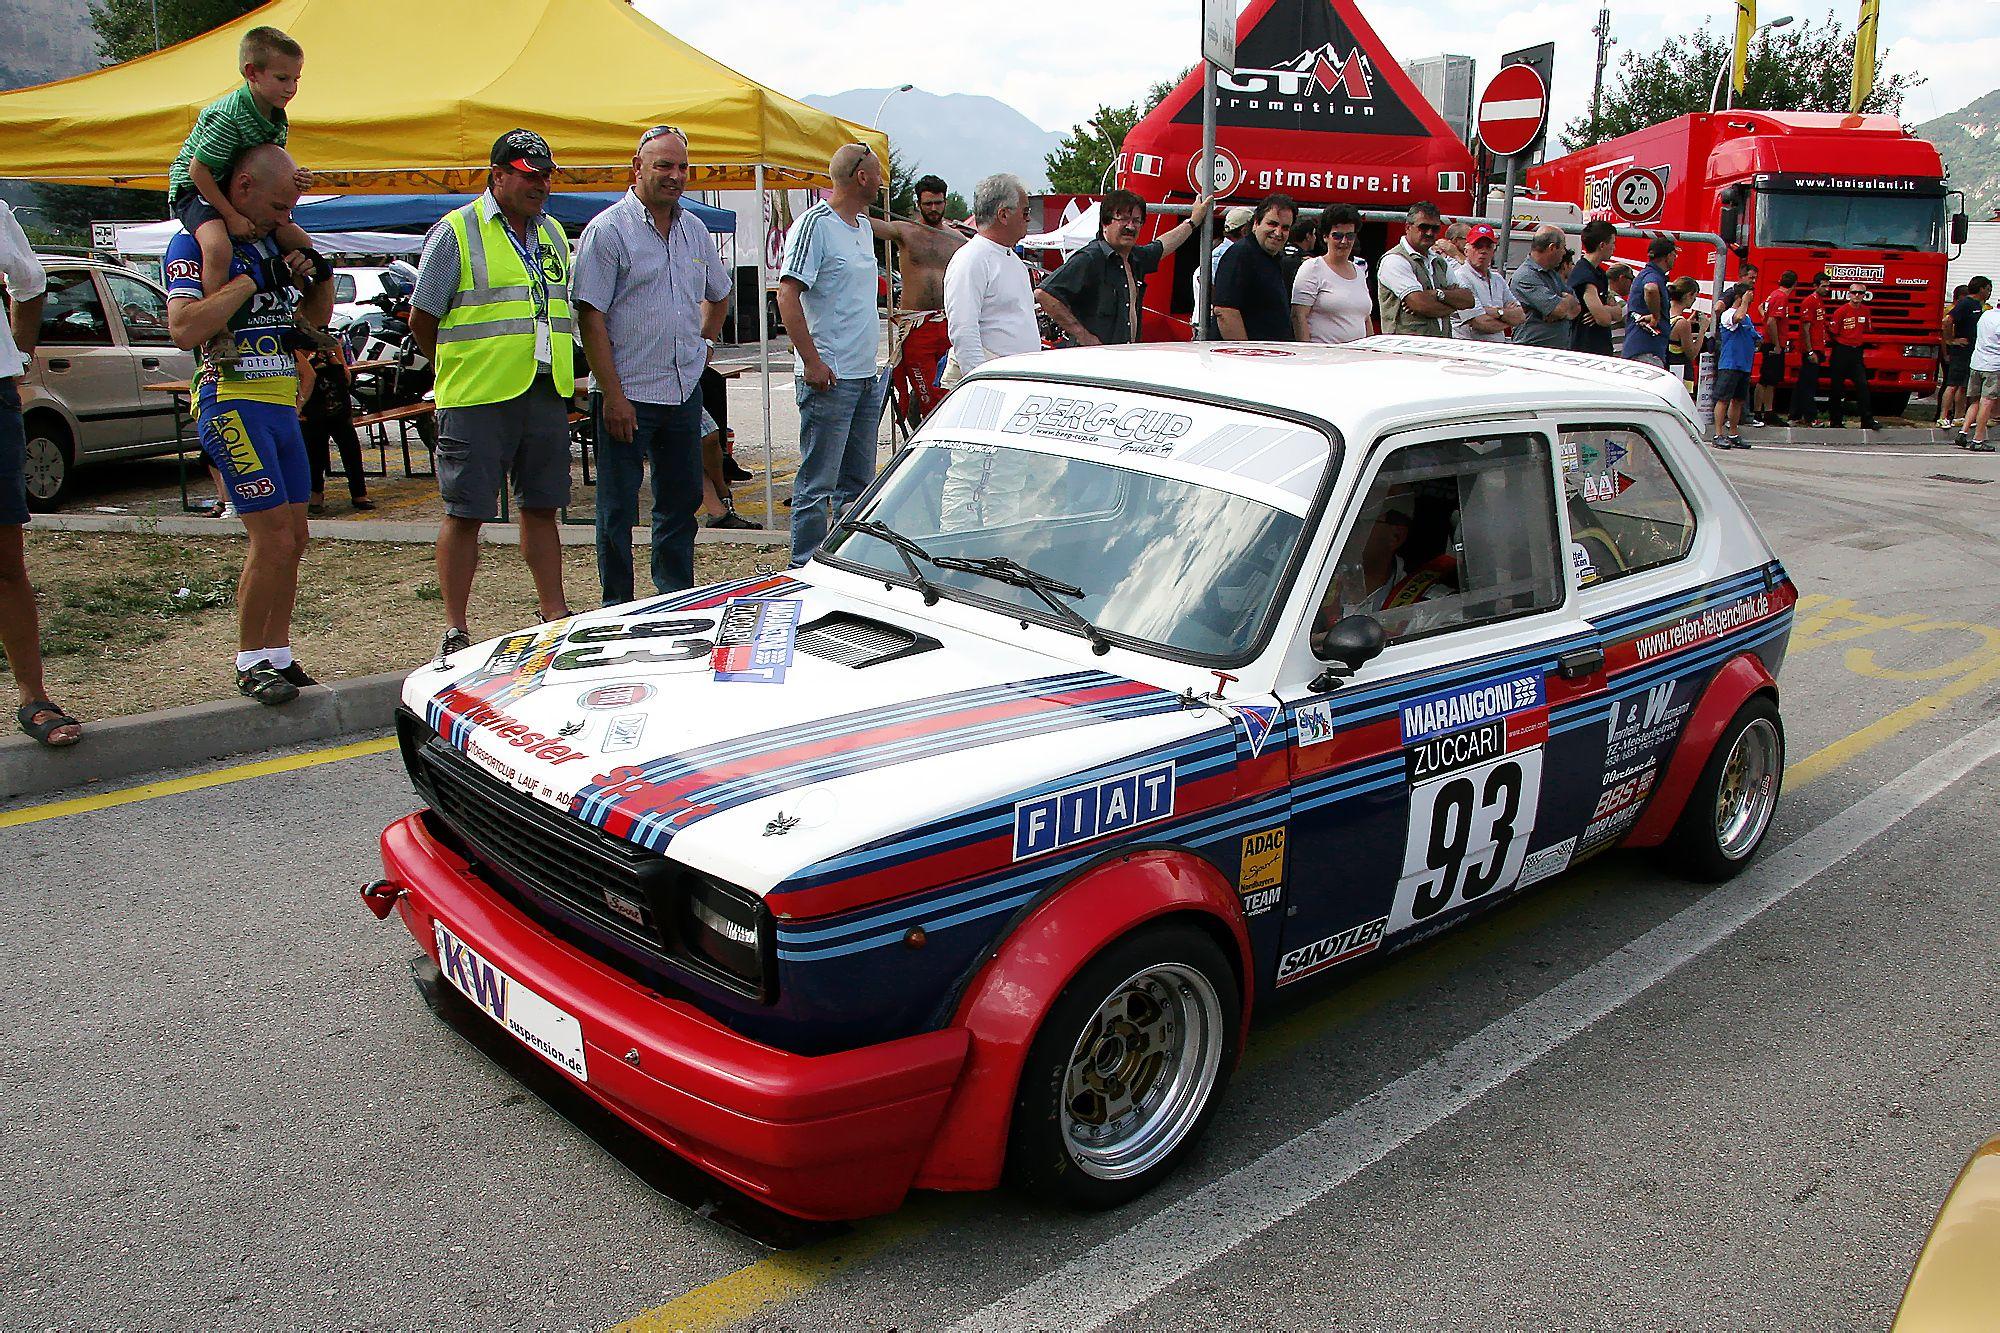 Fiat 127 Series 2 Carros Auto Grupo Fiat